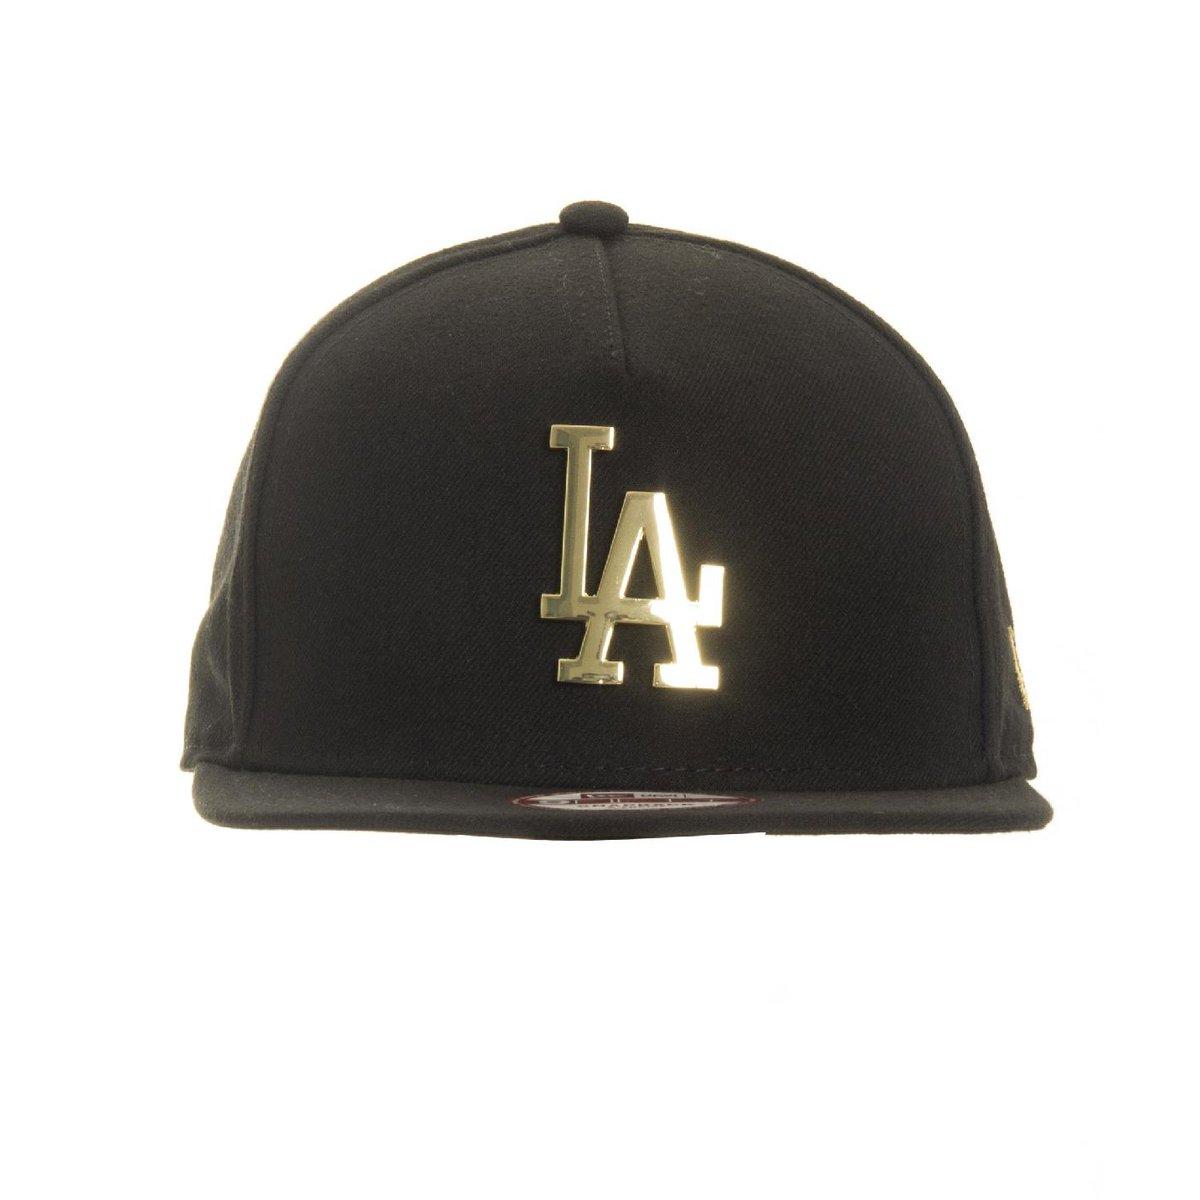 cd01b70566a99 Boné New Era 9FIFTY Snapback Los Angeles Dodgers Gold Metal Logo - Compre  Agora